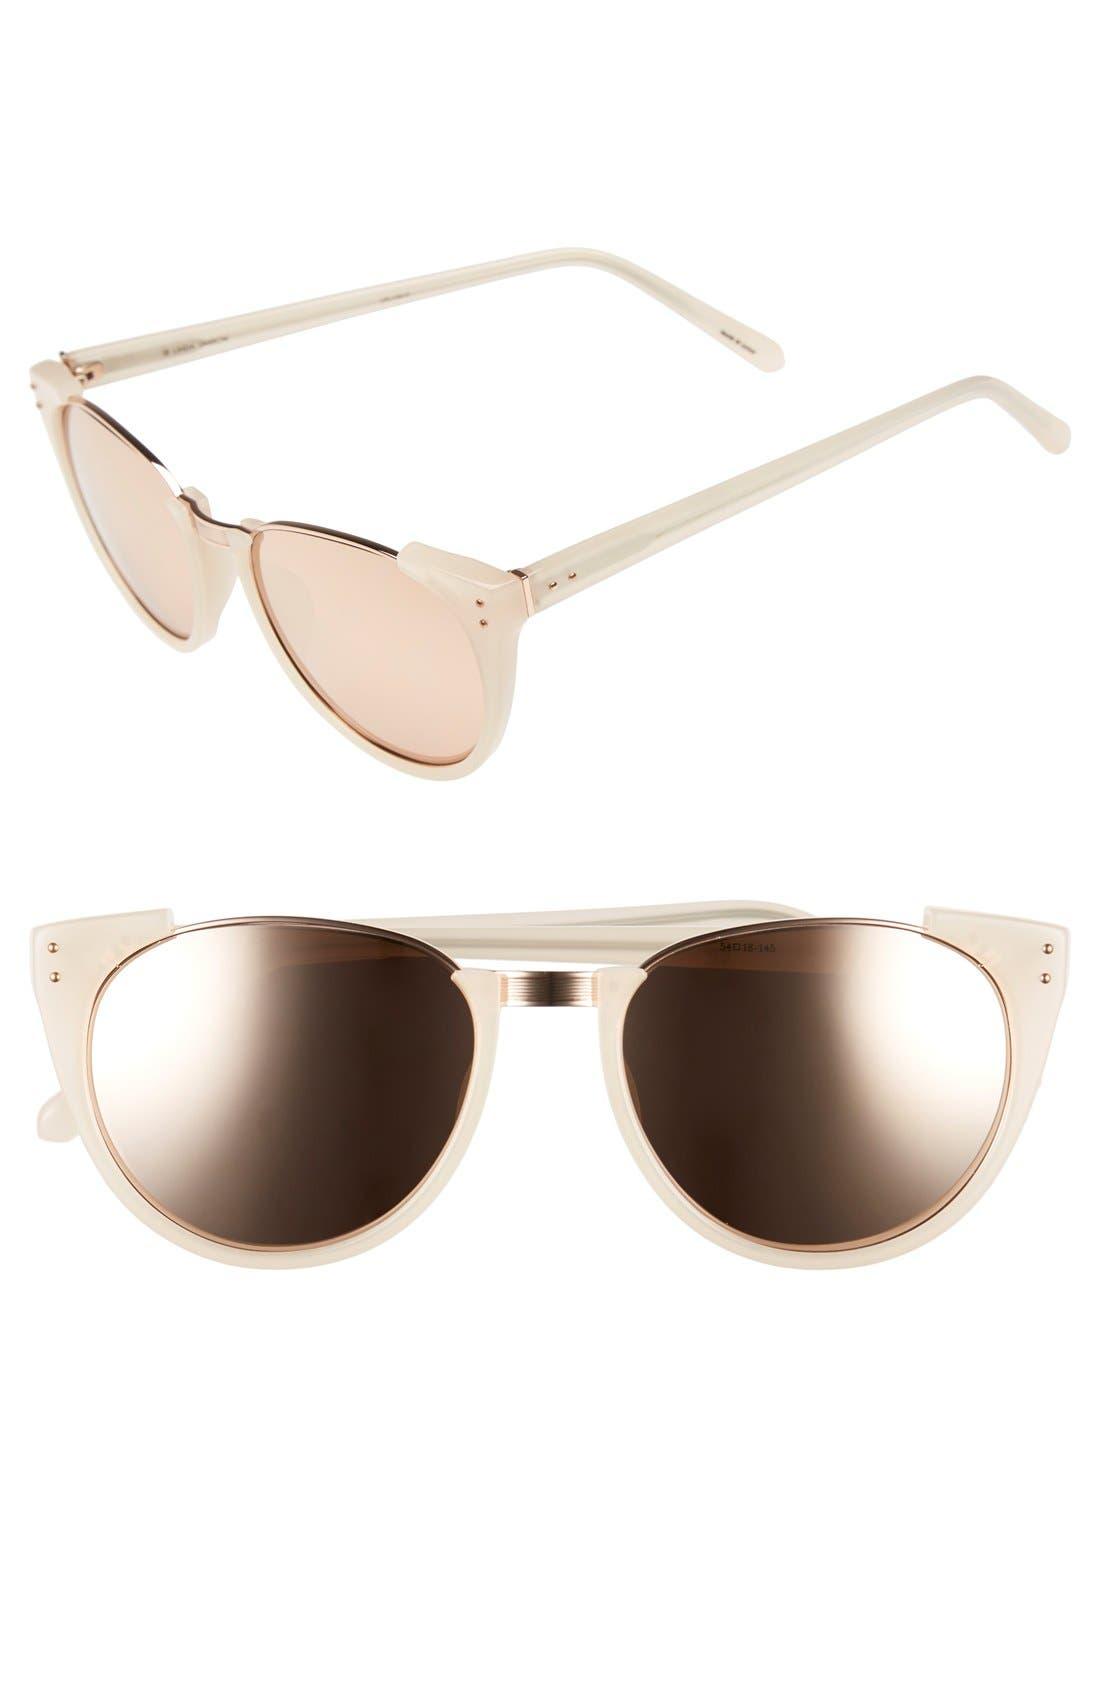 6461c64496f39 kate spade new york narelle 51mm sunglasses